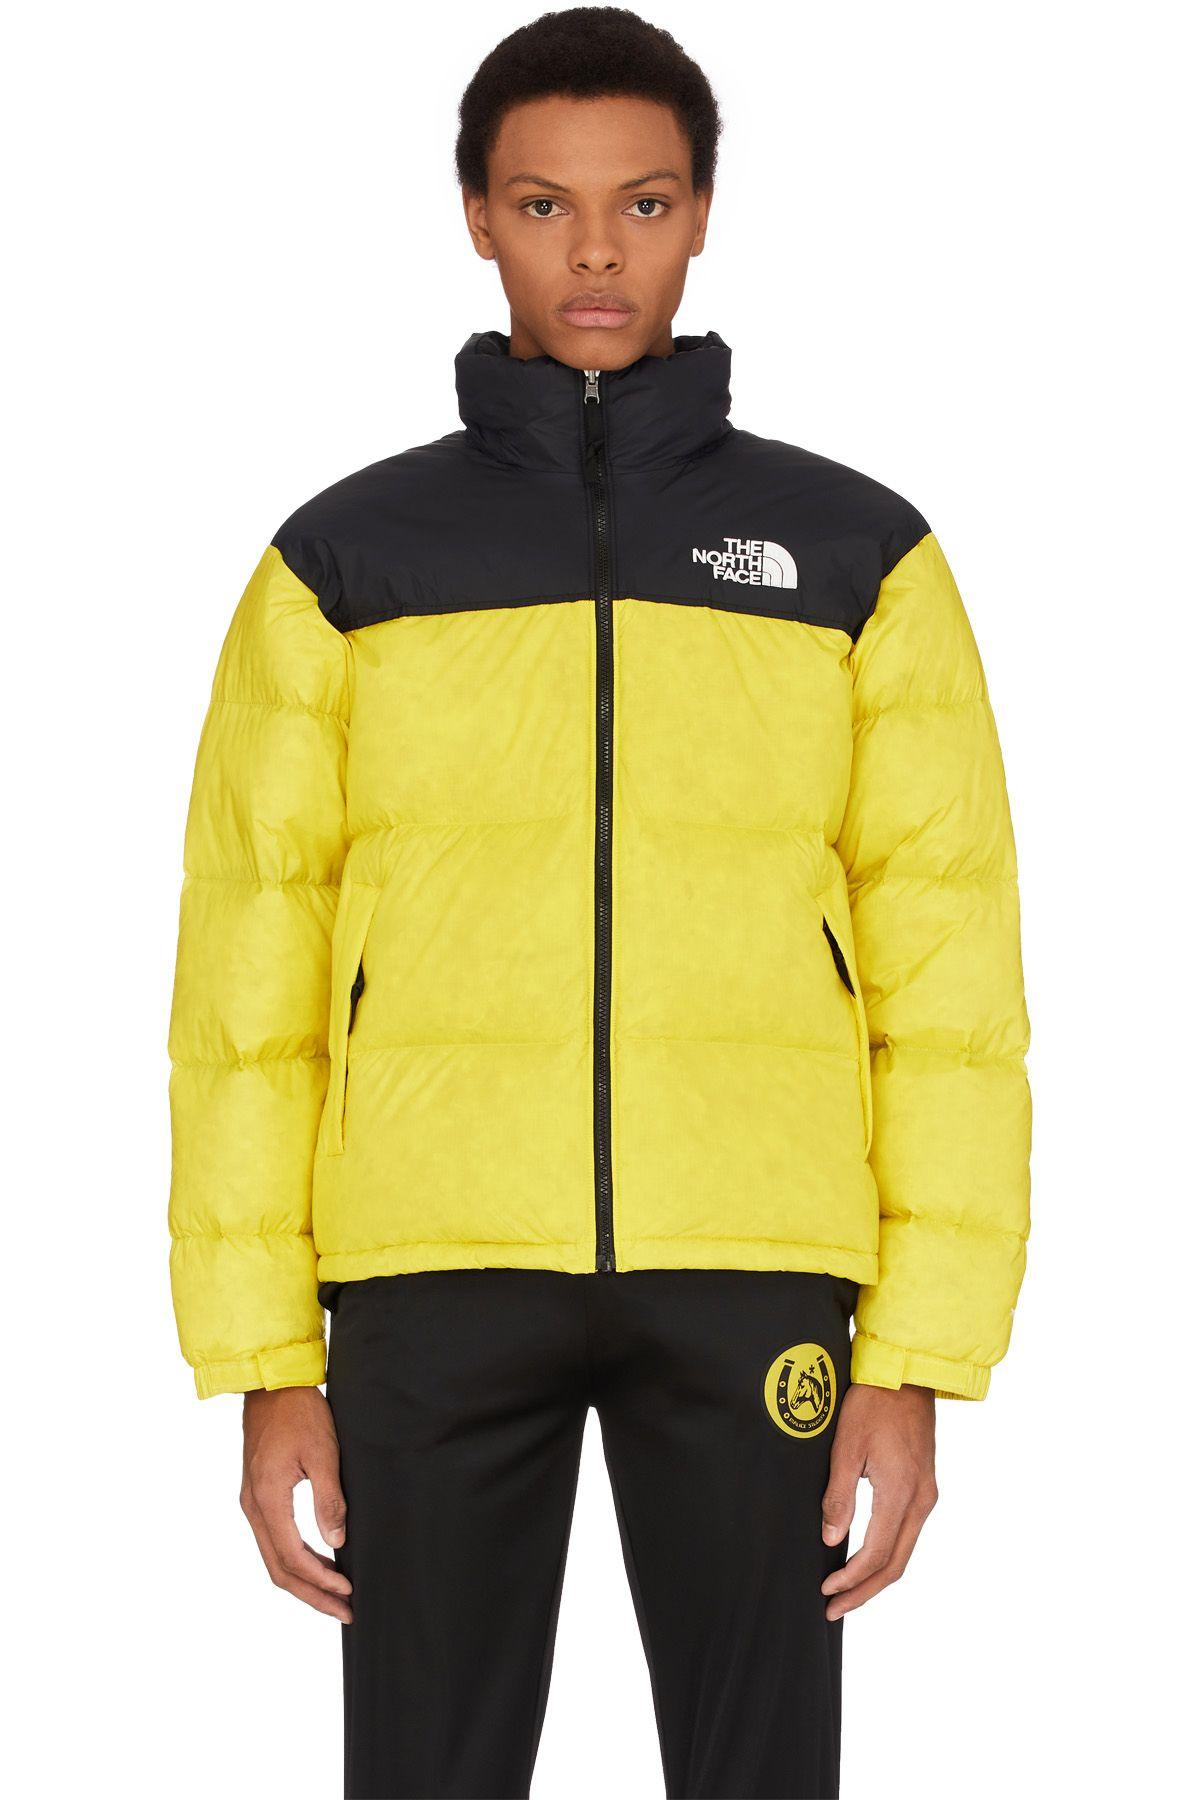 The North Face 1996 Retro Nuptse Jacket Tnf Lemon In 2021 The North Face Retro Nuptse Jacket 1996 Retro Nuptse Jacket [ 1800 x 1200 Pixel ]